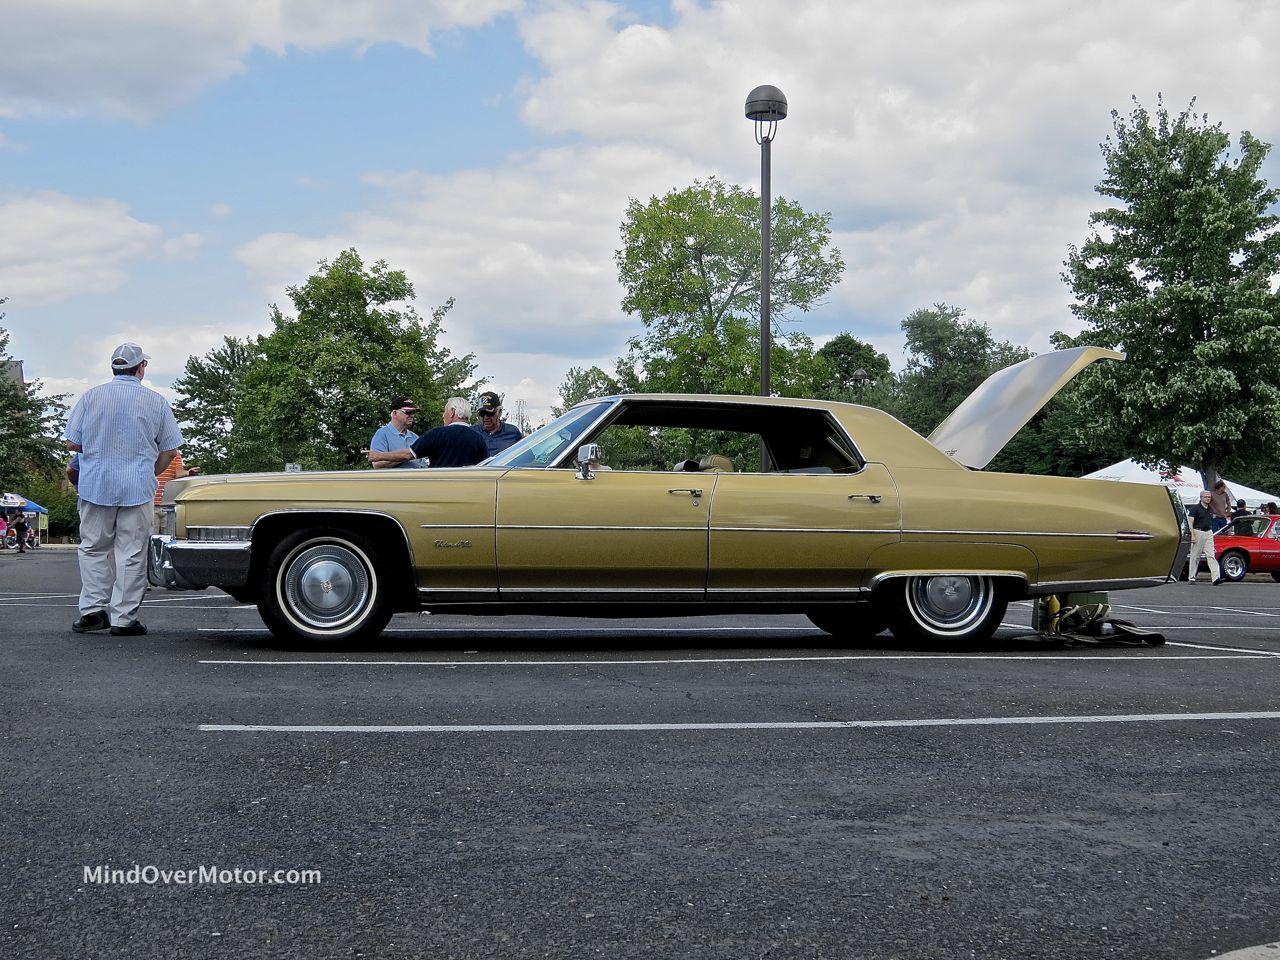 1971 Cadillac Sedan DeVille Profile